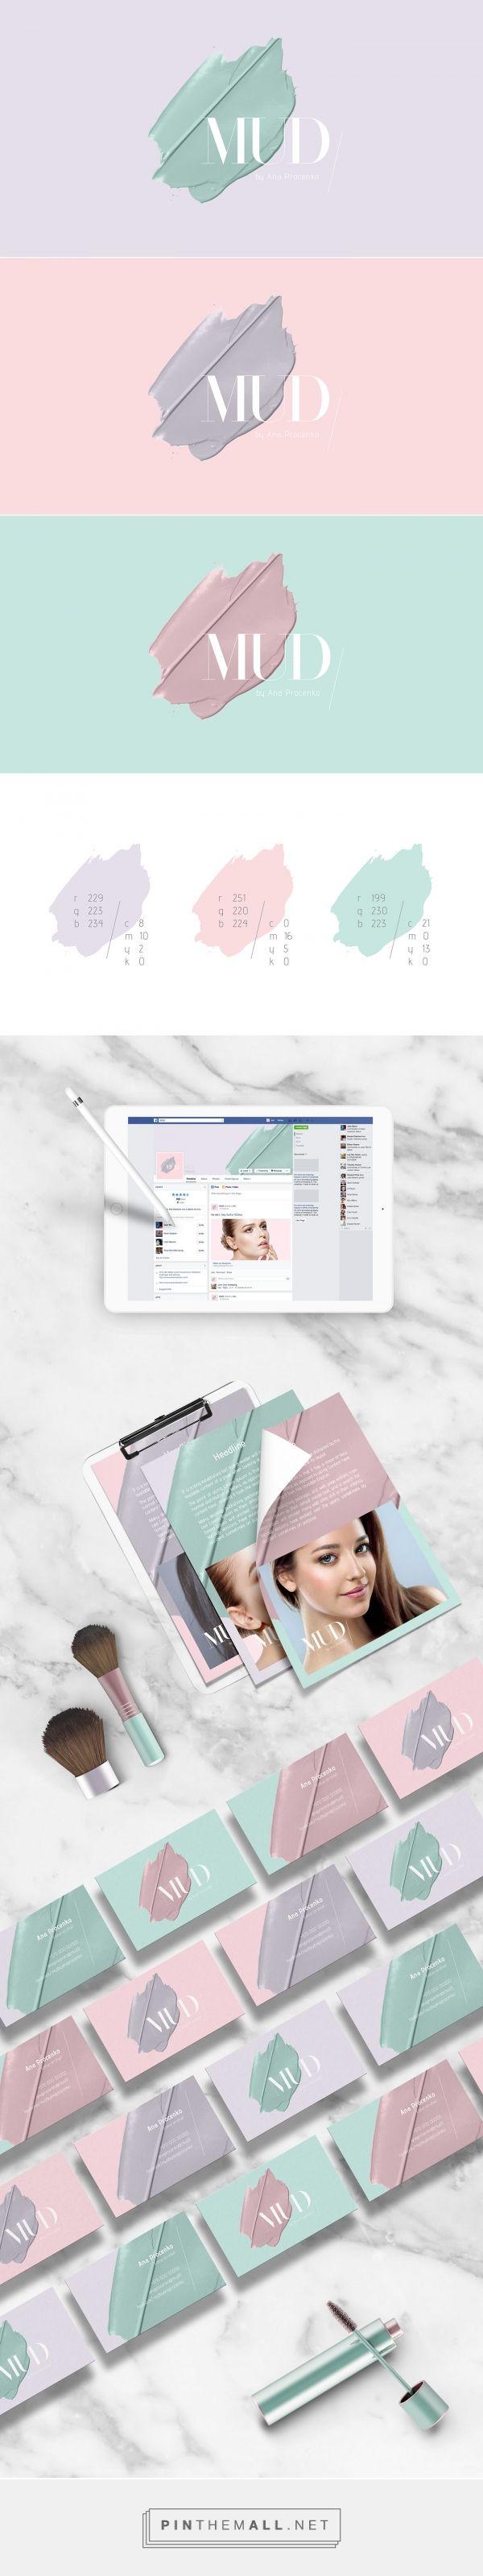 MUD Cosmetics Branding by Migle Sciglinskaite | Fivestar Branding Agency – Design and Branding Agency & Curated Inspiration Gallery